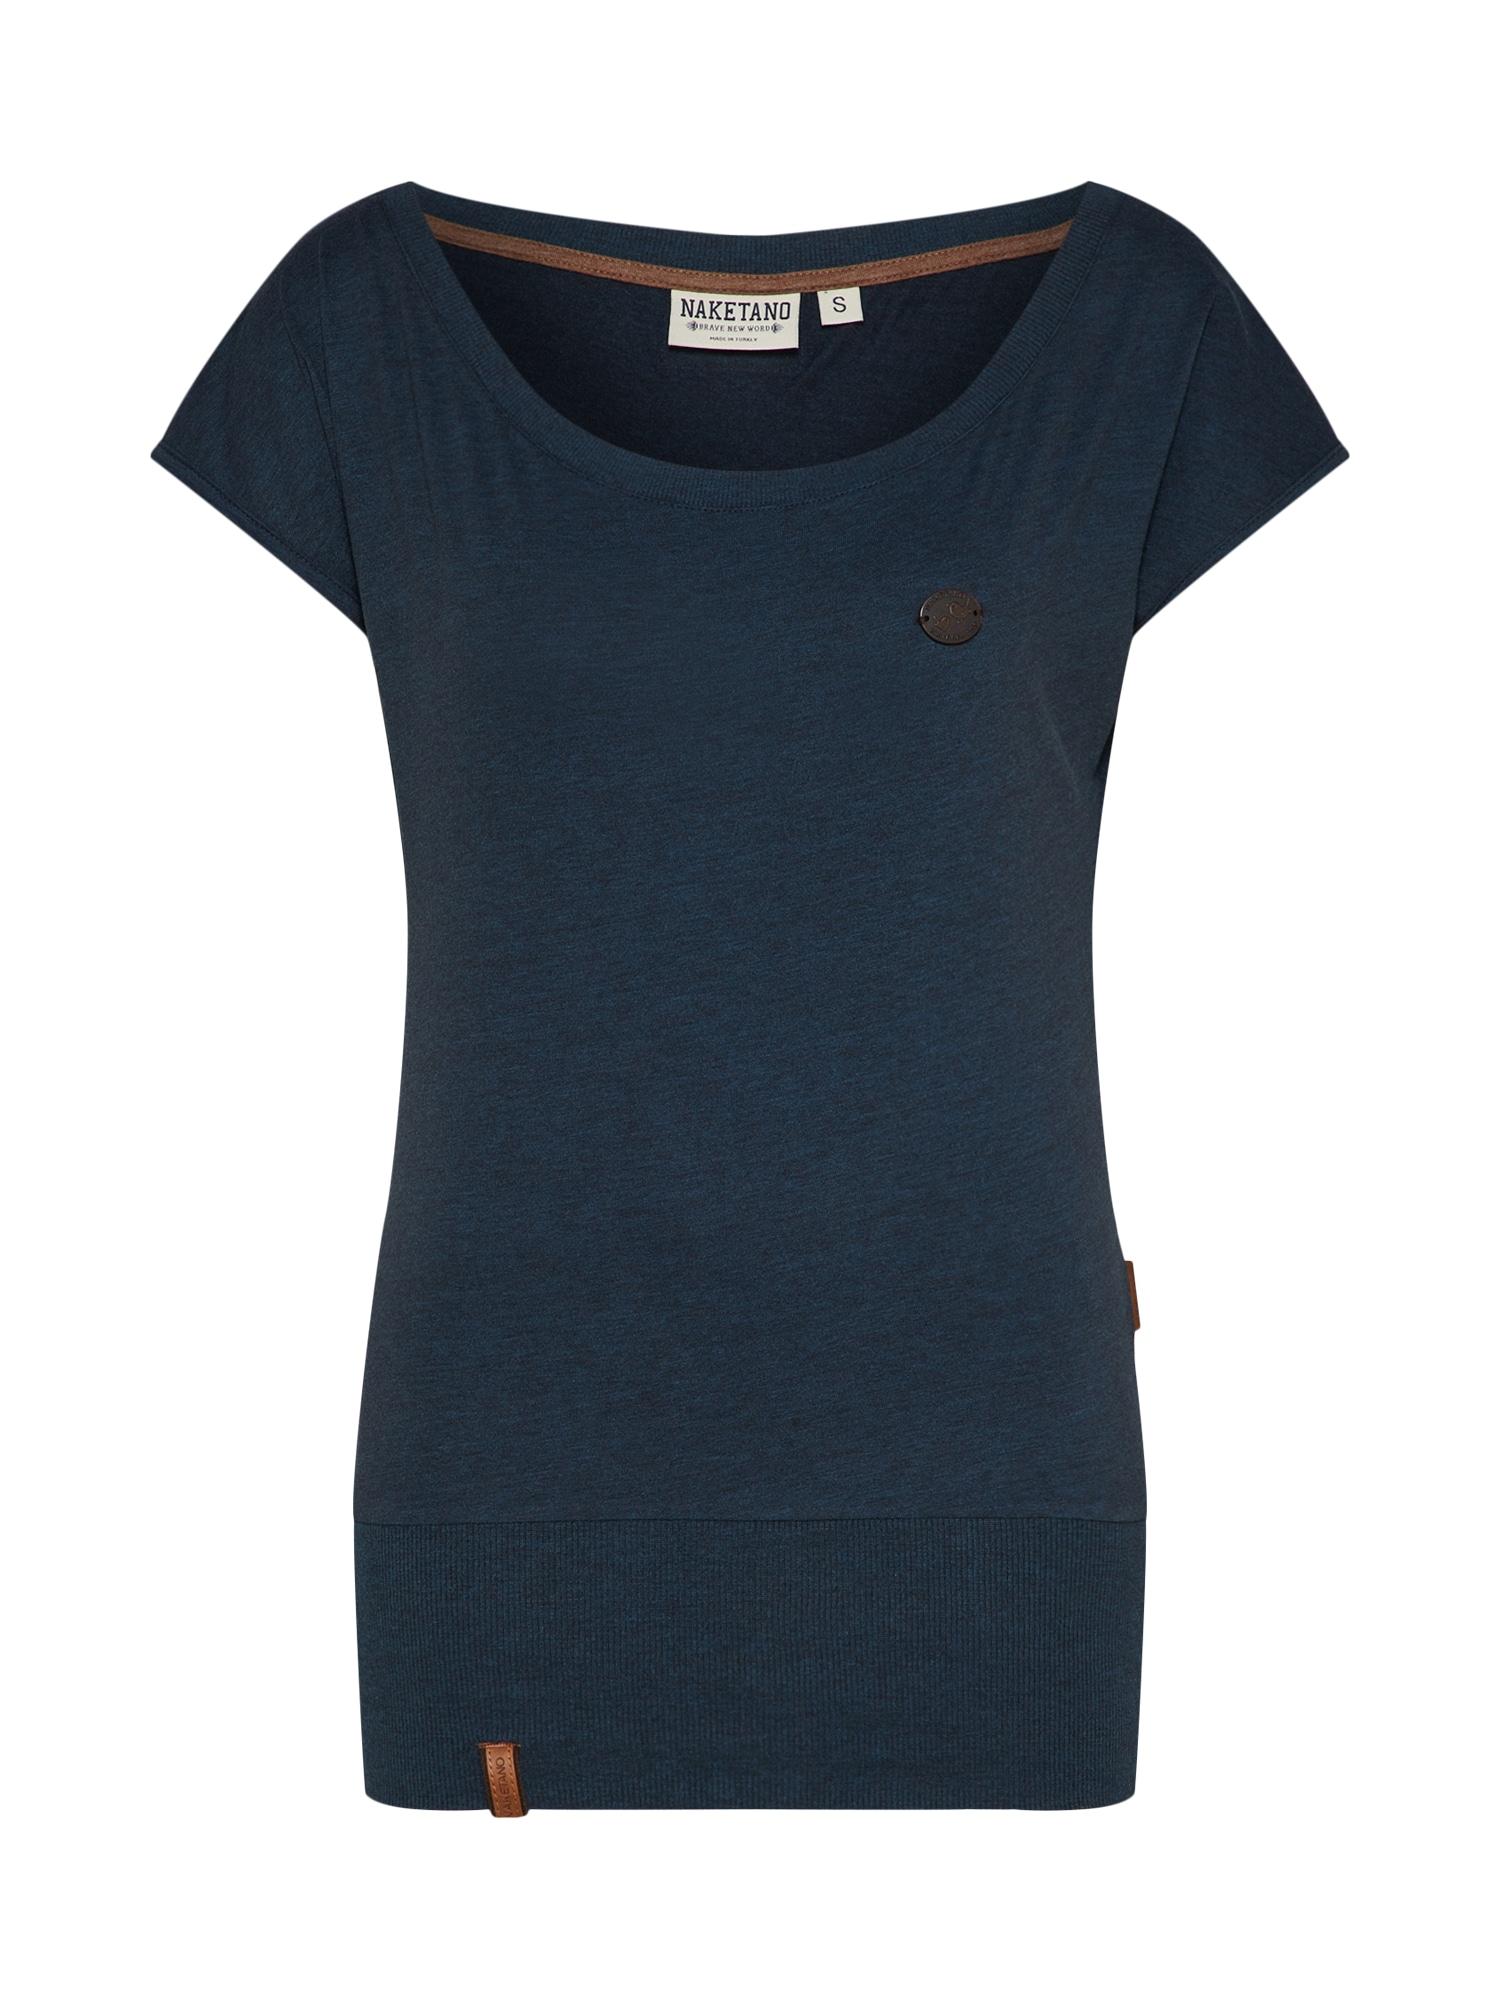 Naketano, Dames Shirt 'Dirty Wolle', donkerblauw